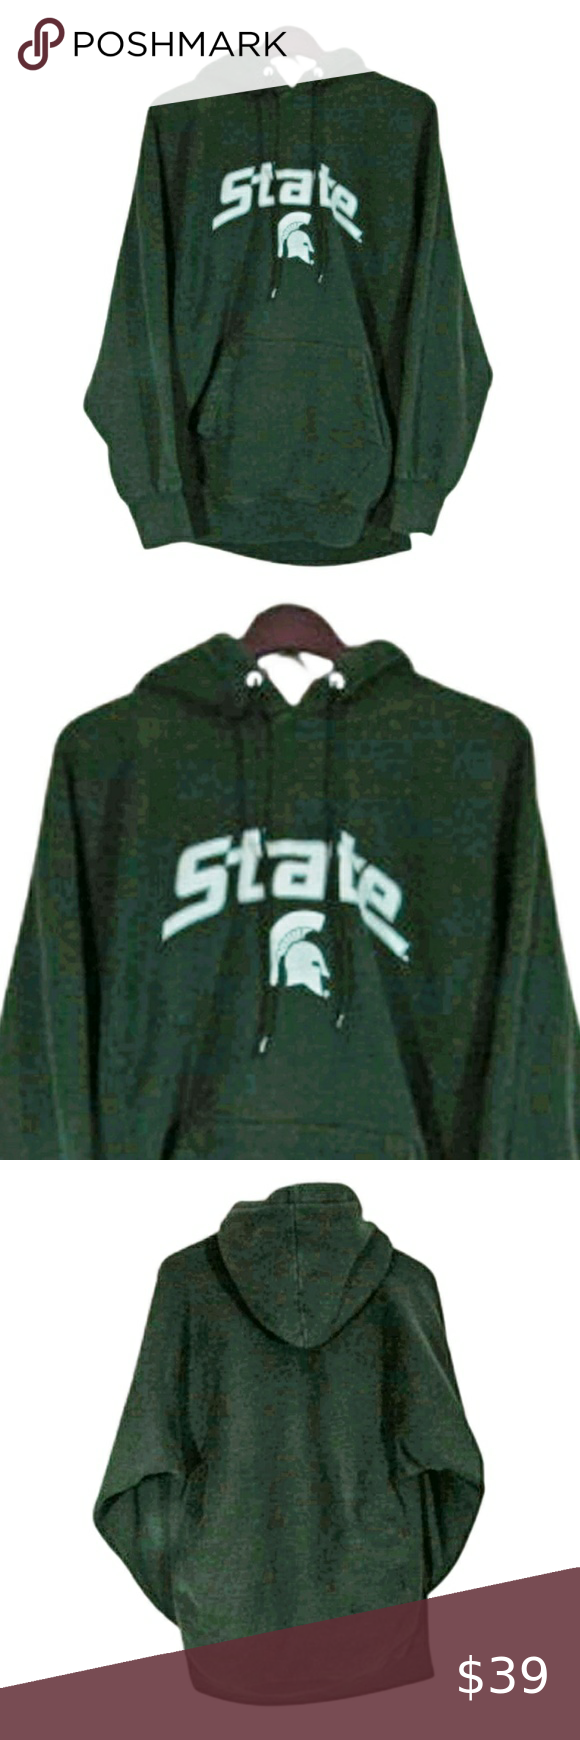 Michigan State Spartans Football Hoodie Size M Green Hoodie Men Michigan State Spartans Football Hoodies [ 1740 x 580 Pixel ]